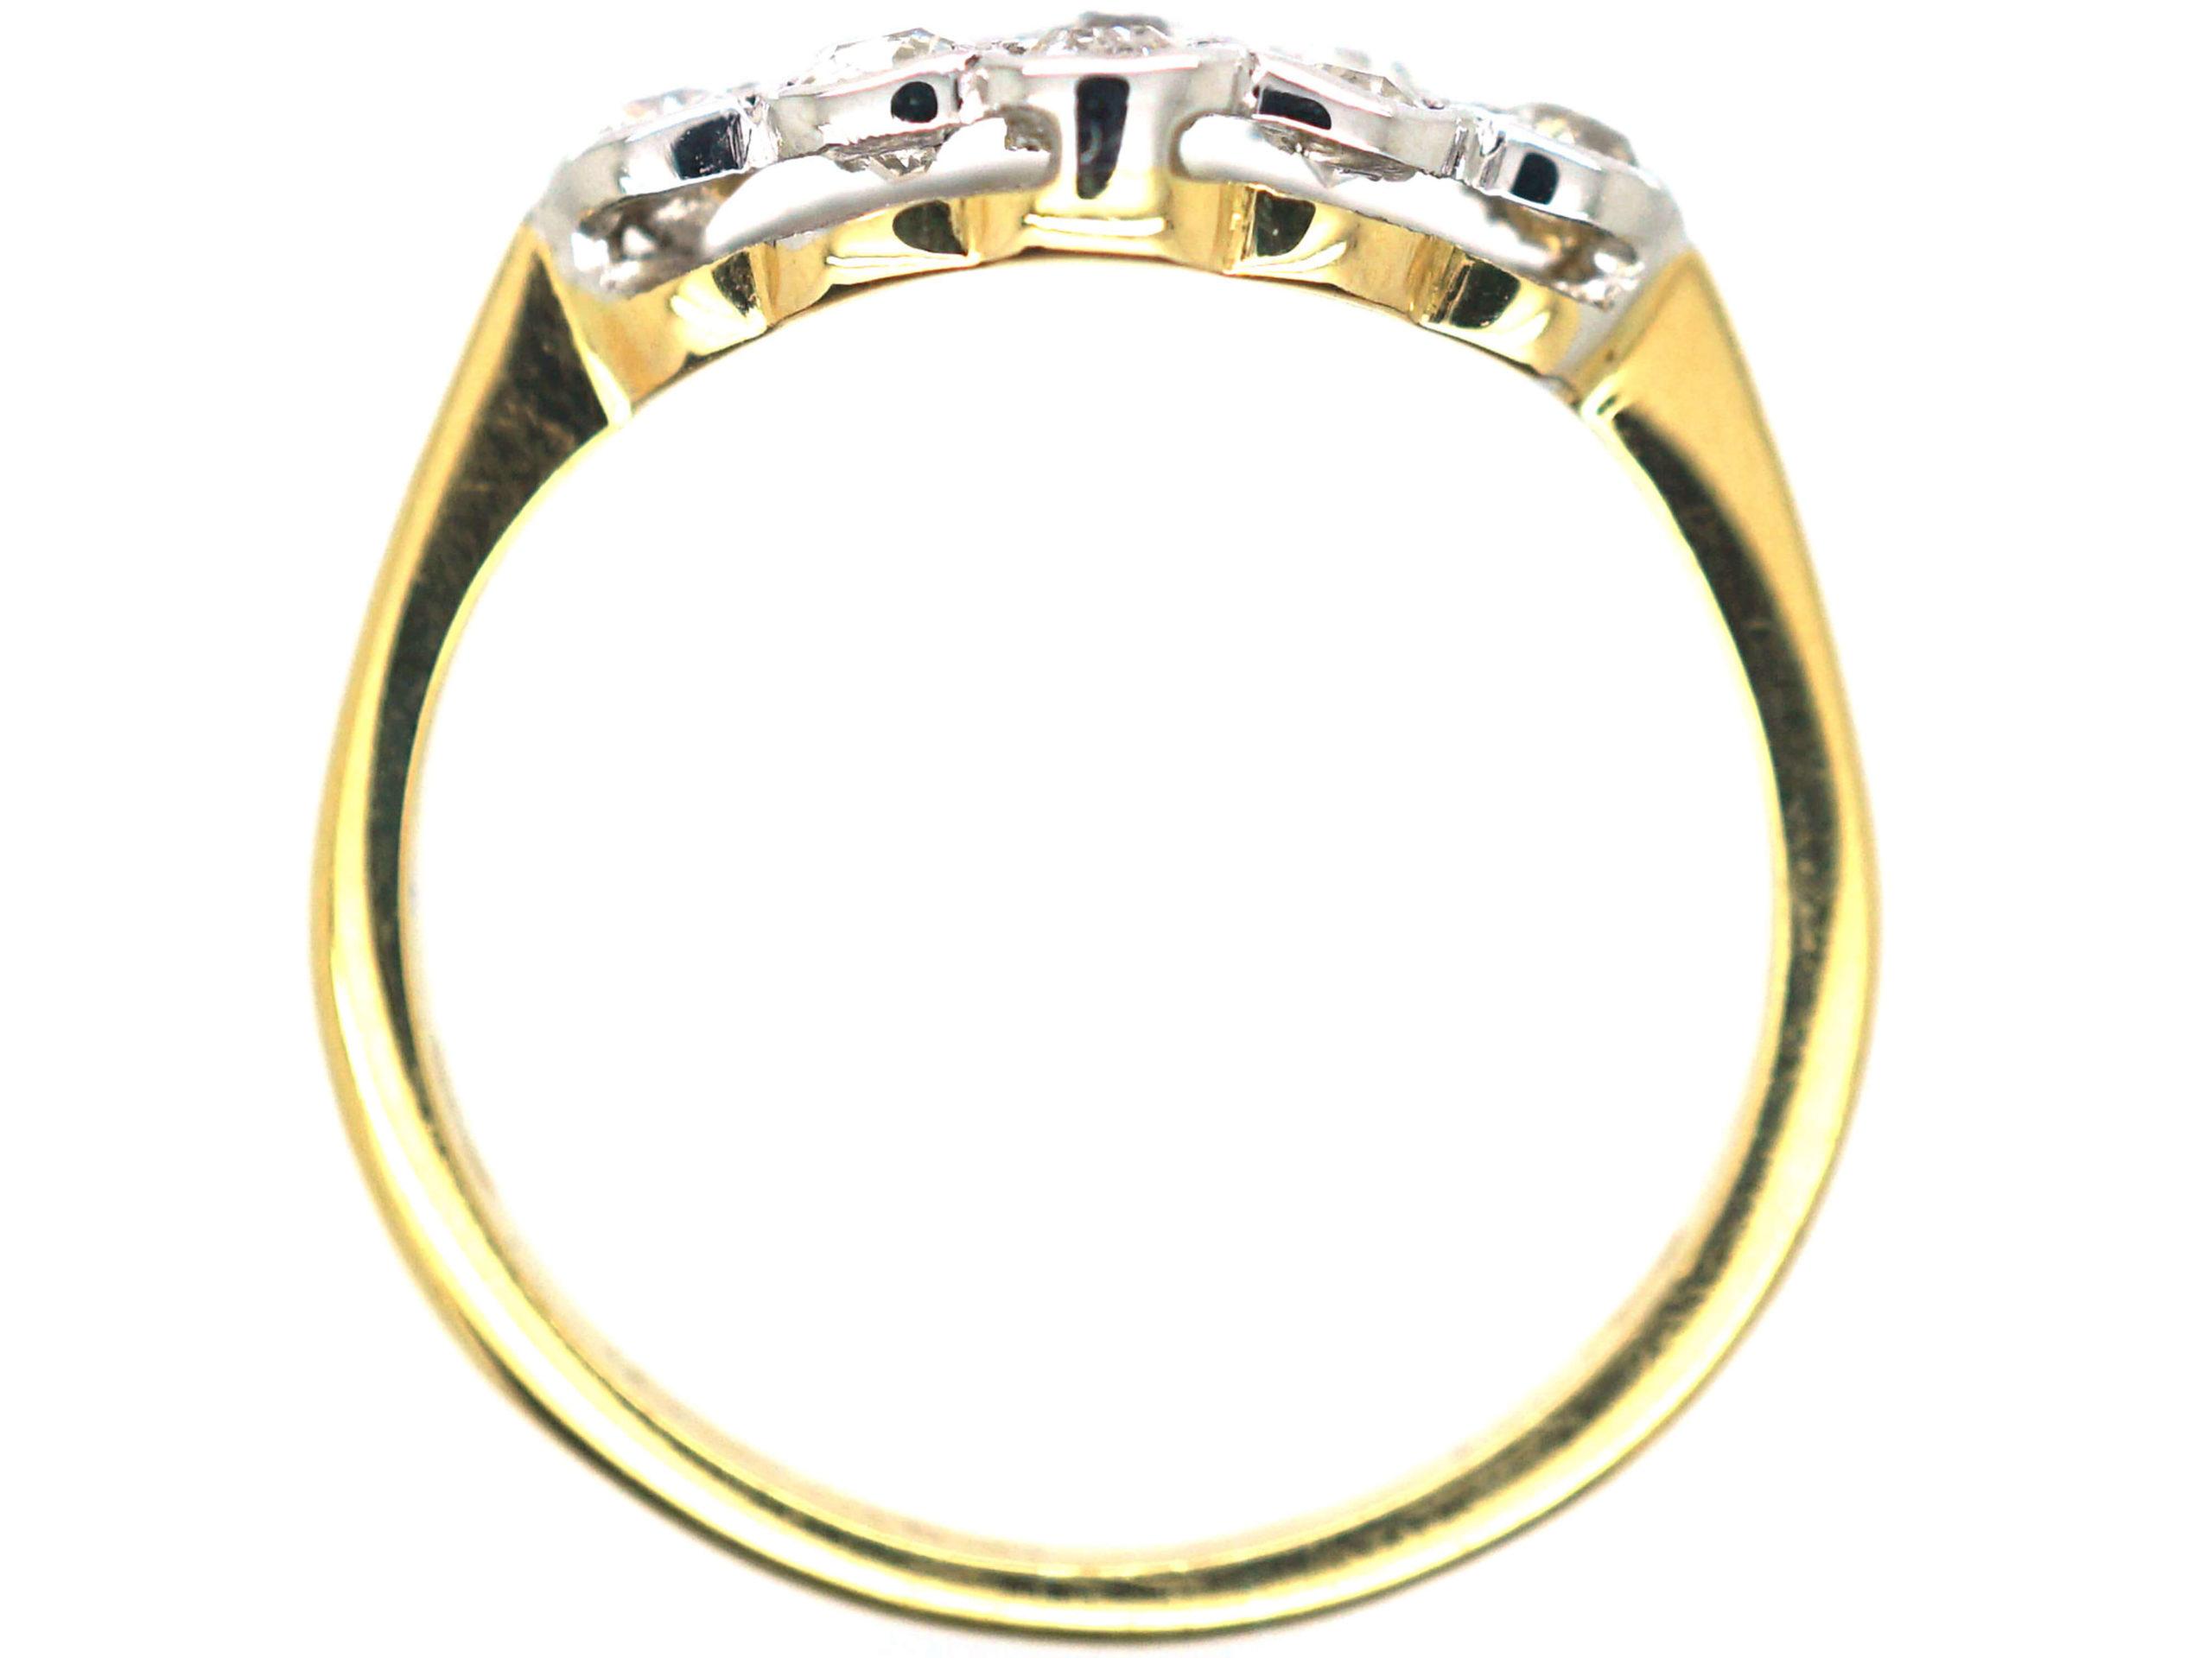 Edwardian 18ct Gold & Platinum Diamond Oval Cluster Ring